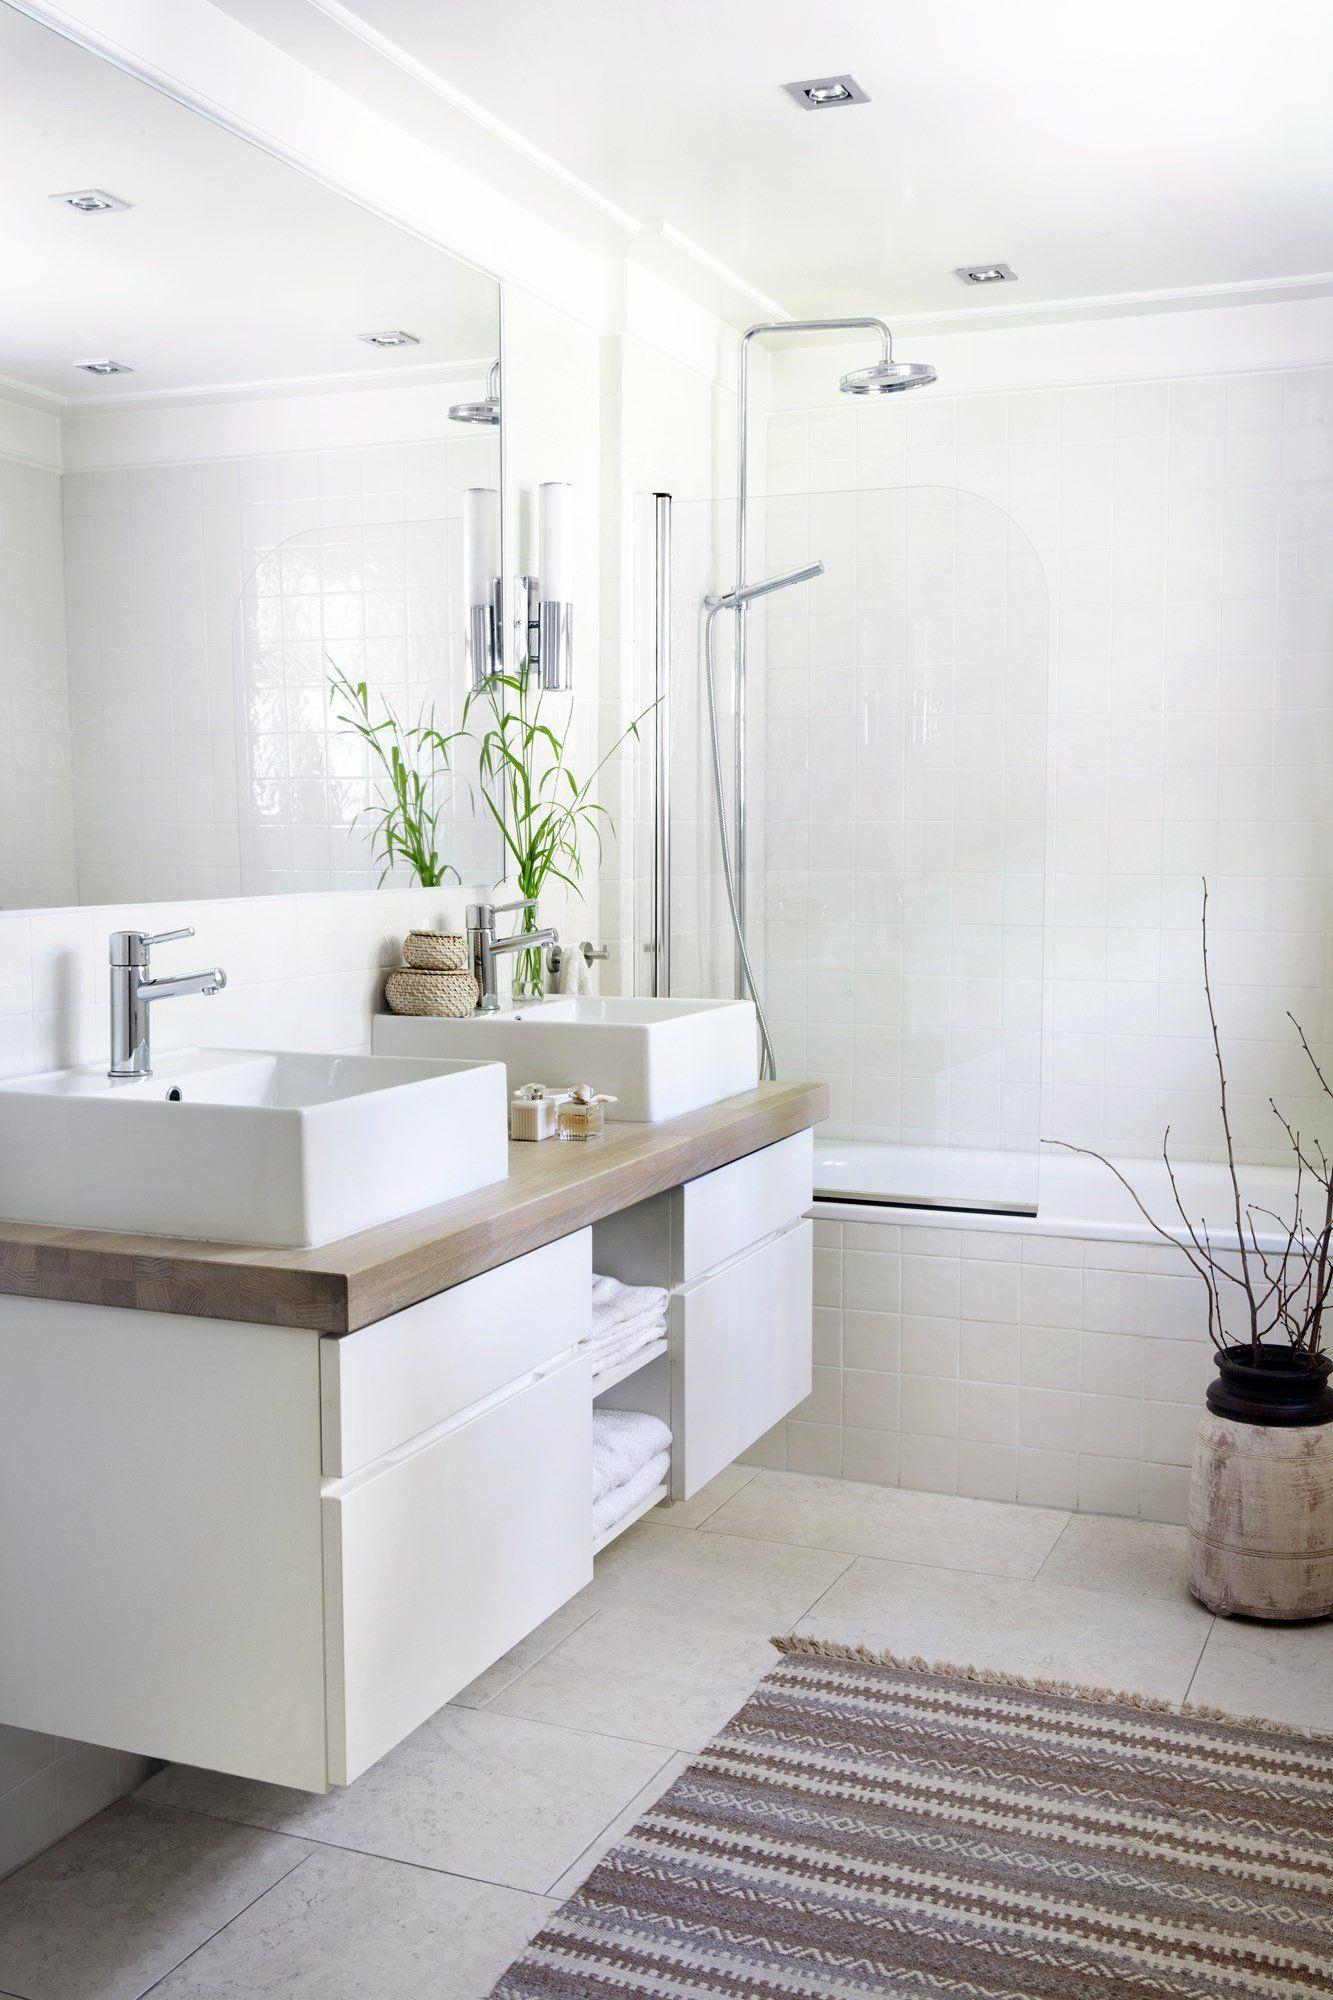 wooden worktop, stone floor, rug and plant | Dream bathrooms ...